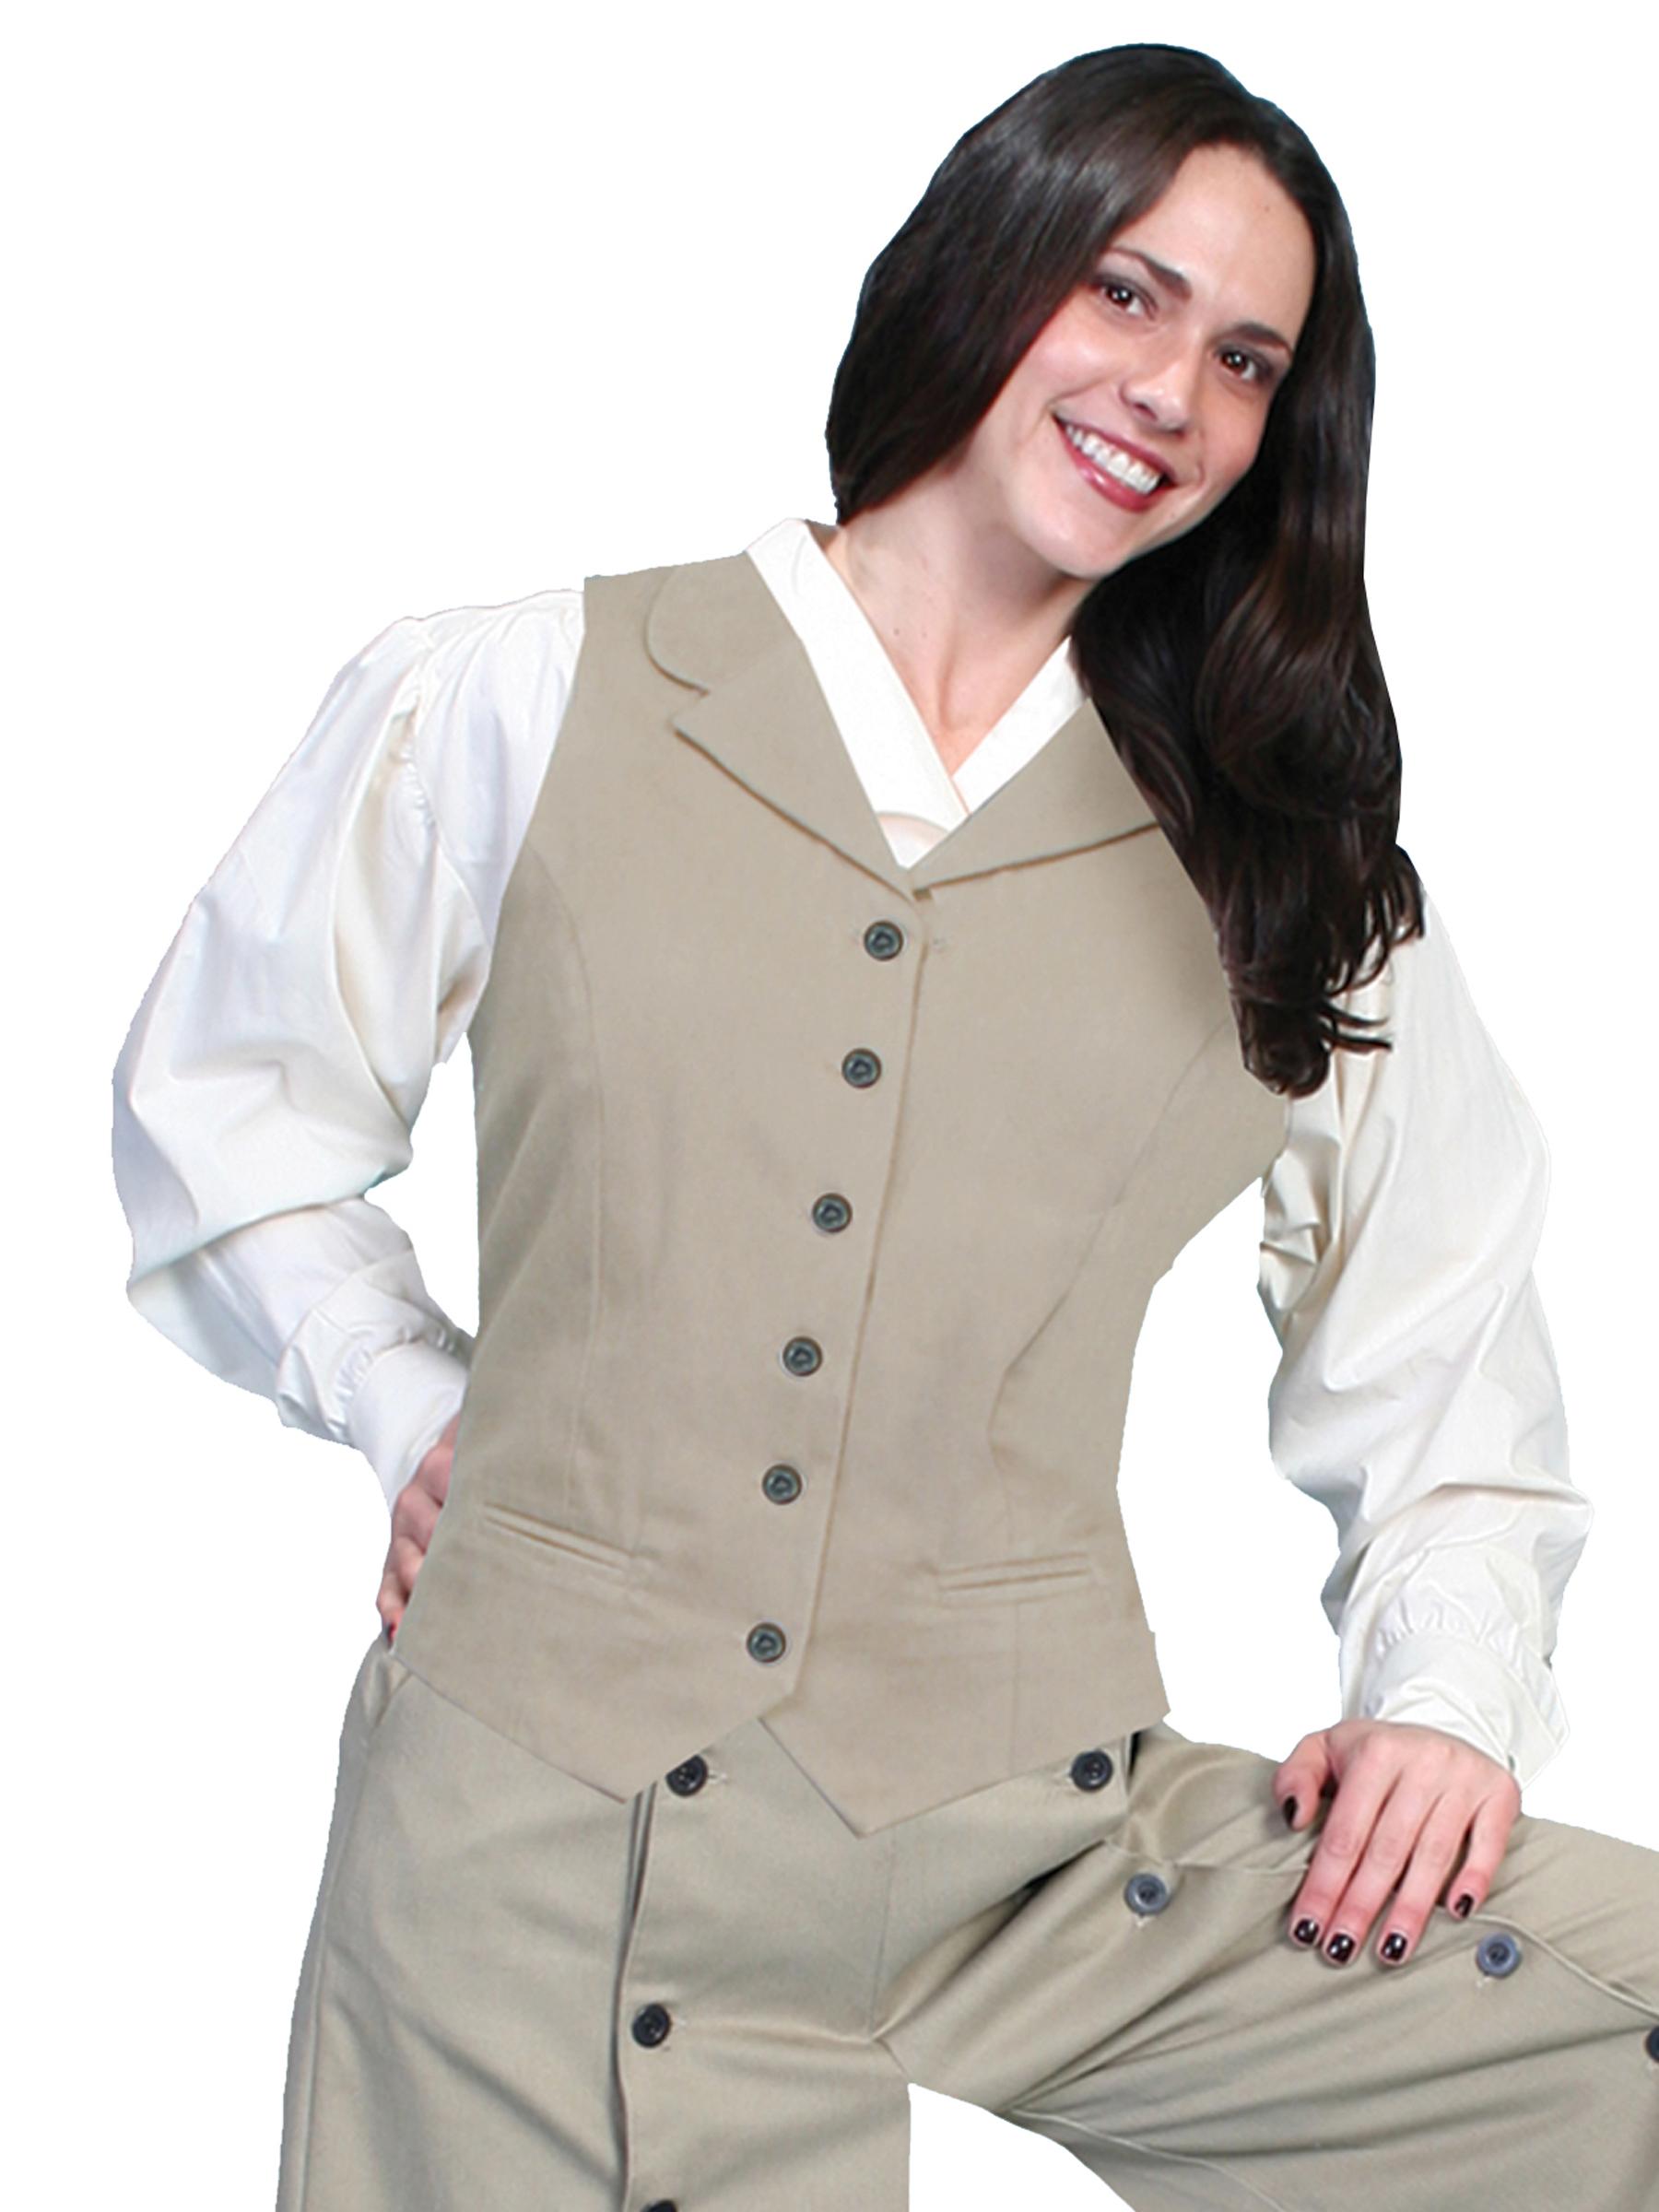 Classic victorian style vest